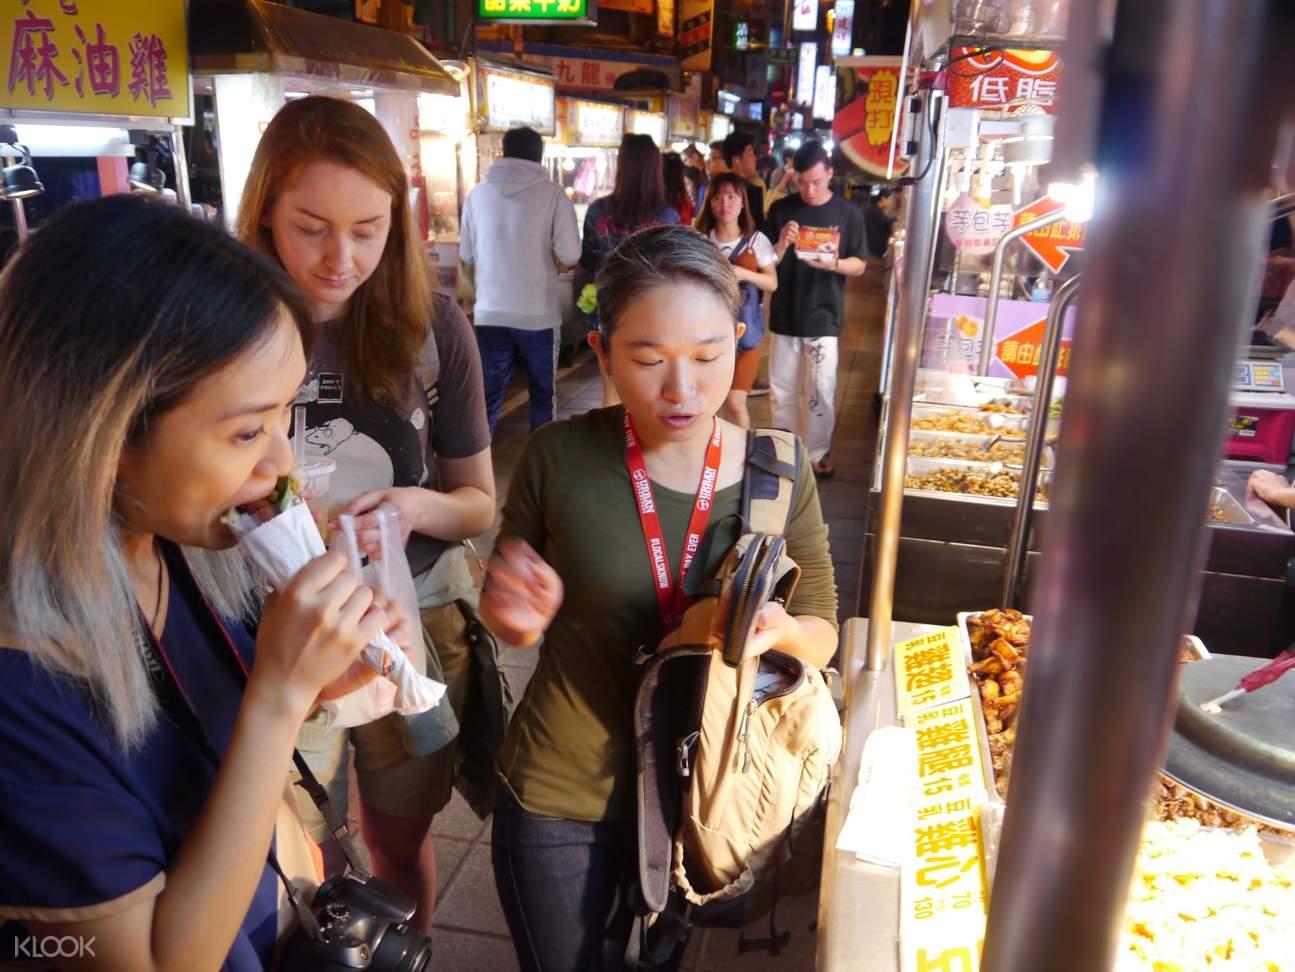 Night Market Michelin Food Tour